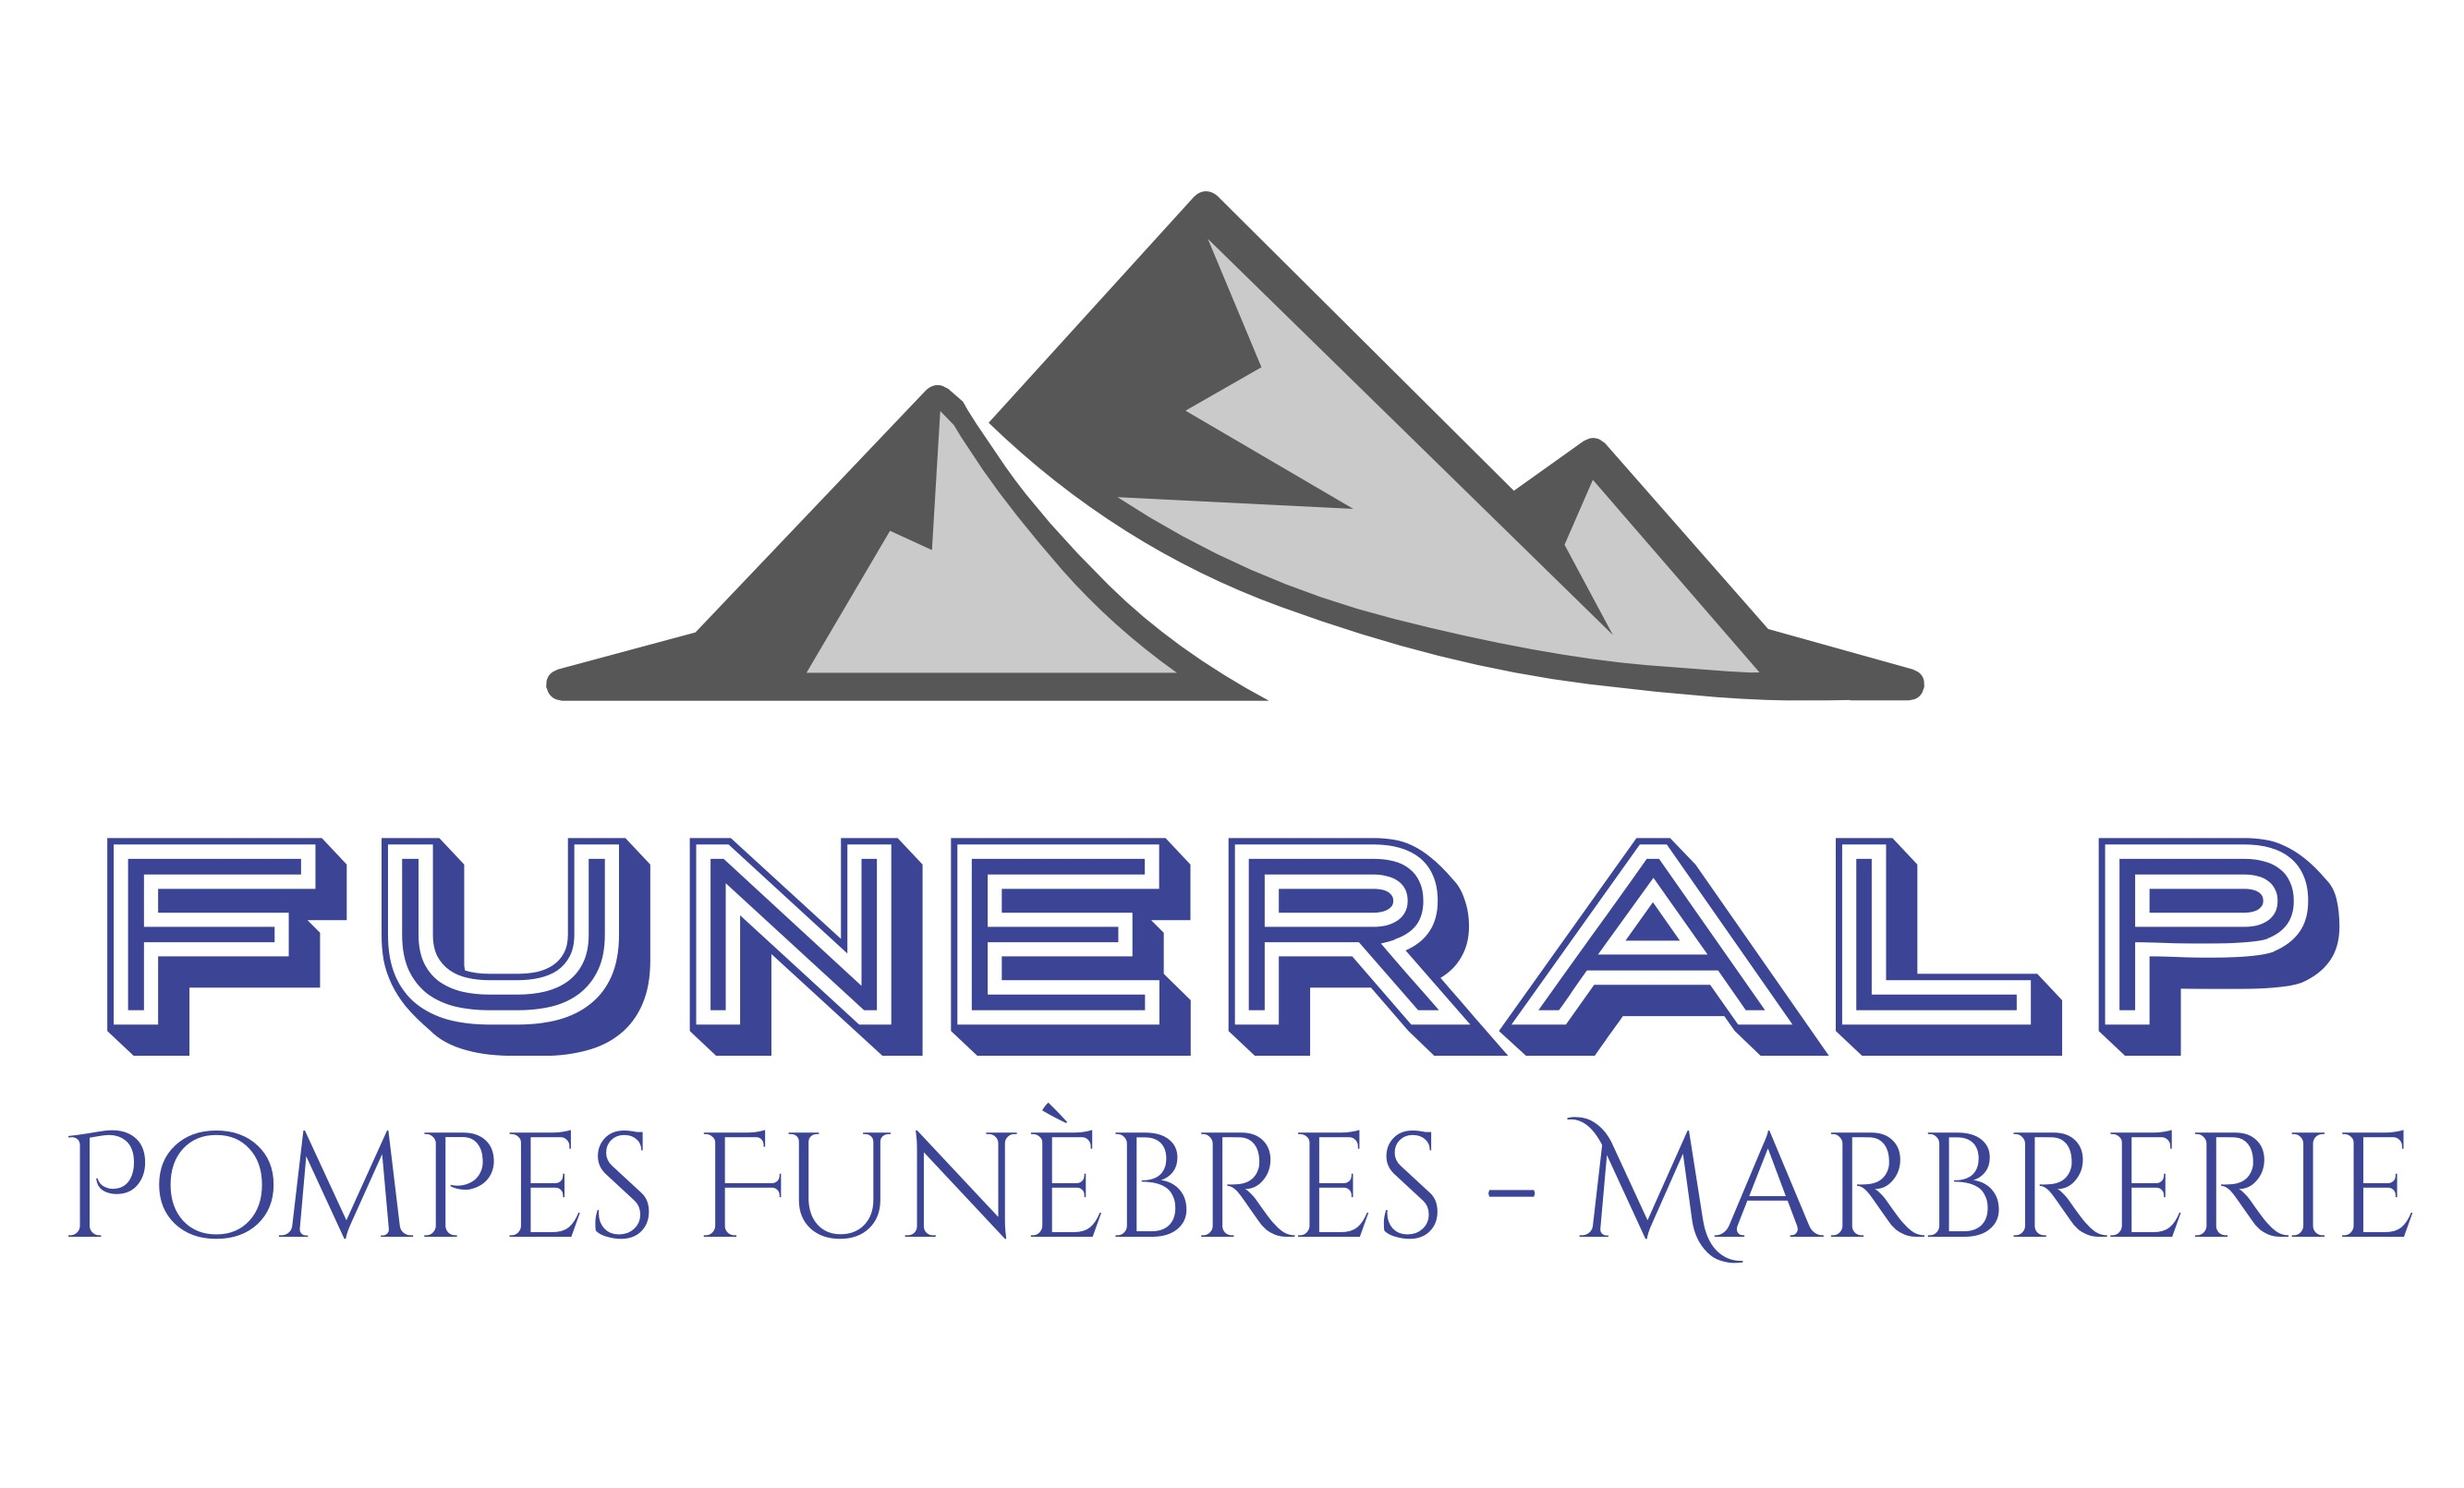 Pompes Funèbres Funeralp